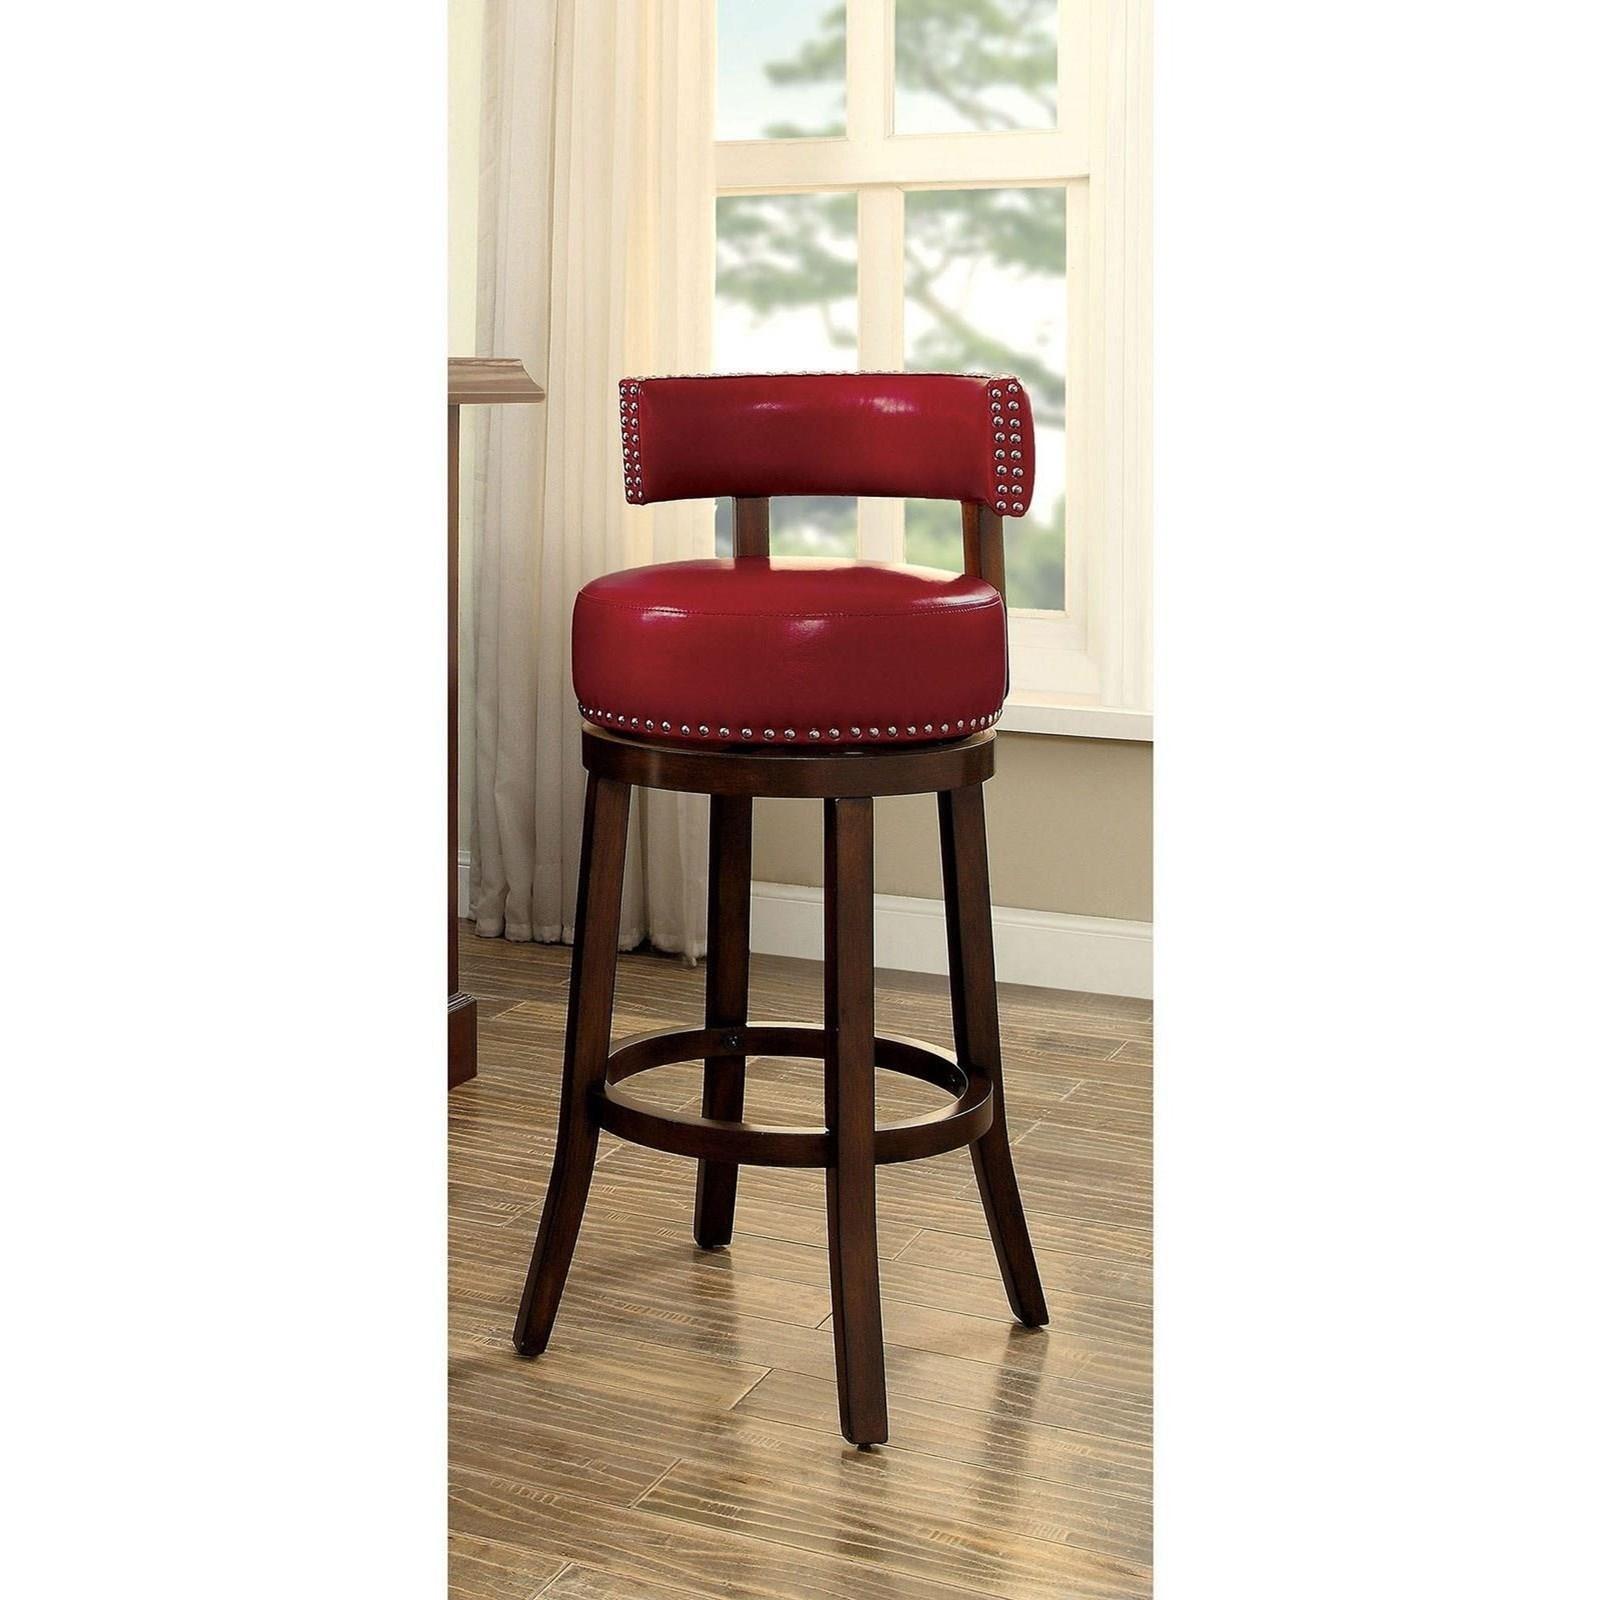 "Shirley 24"" Bar Stool at Household Furniture"